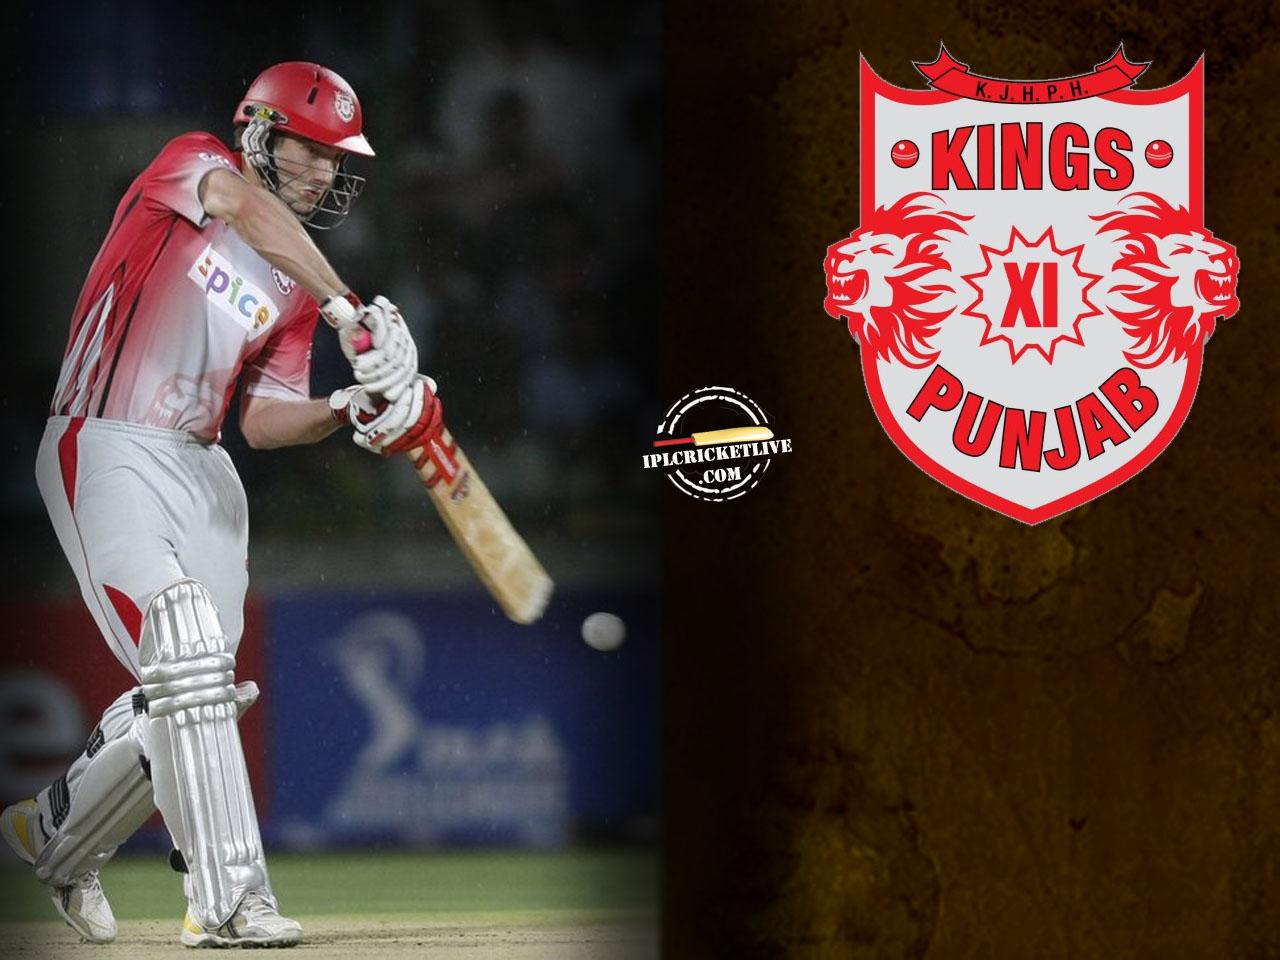 Kings xi punjab photo gallery Home m